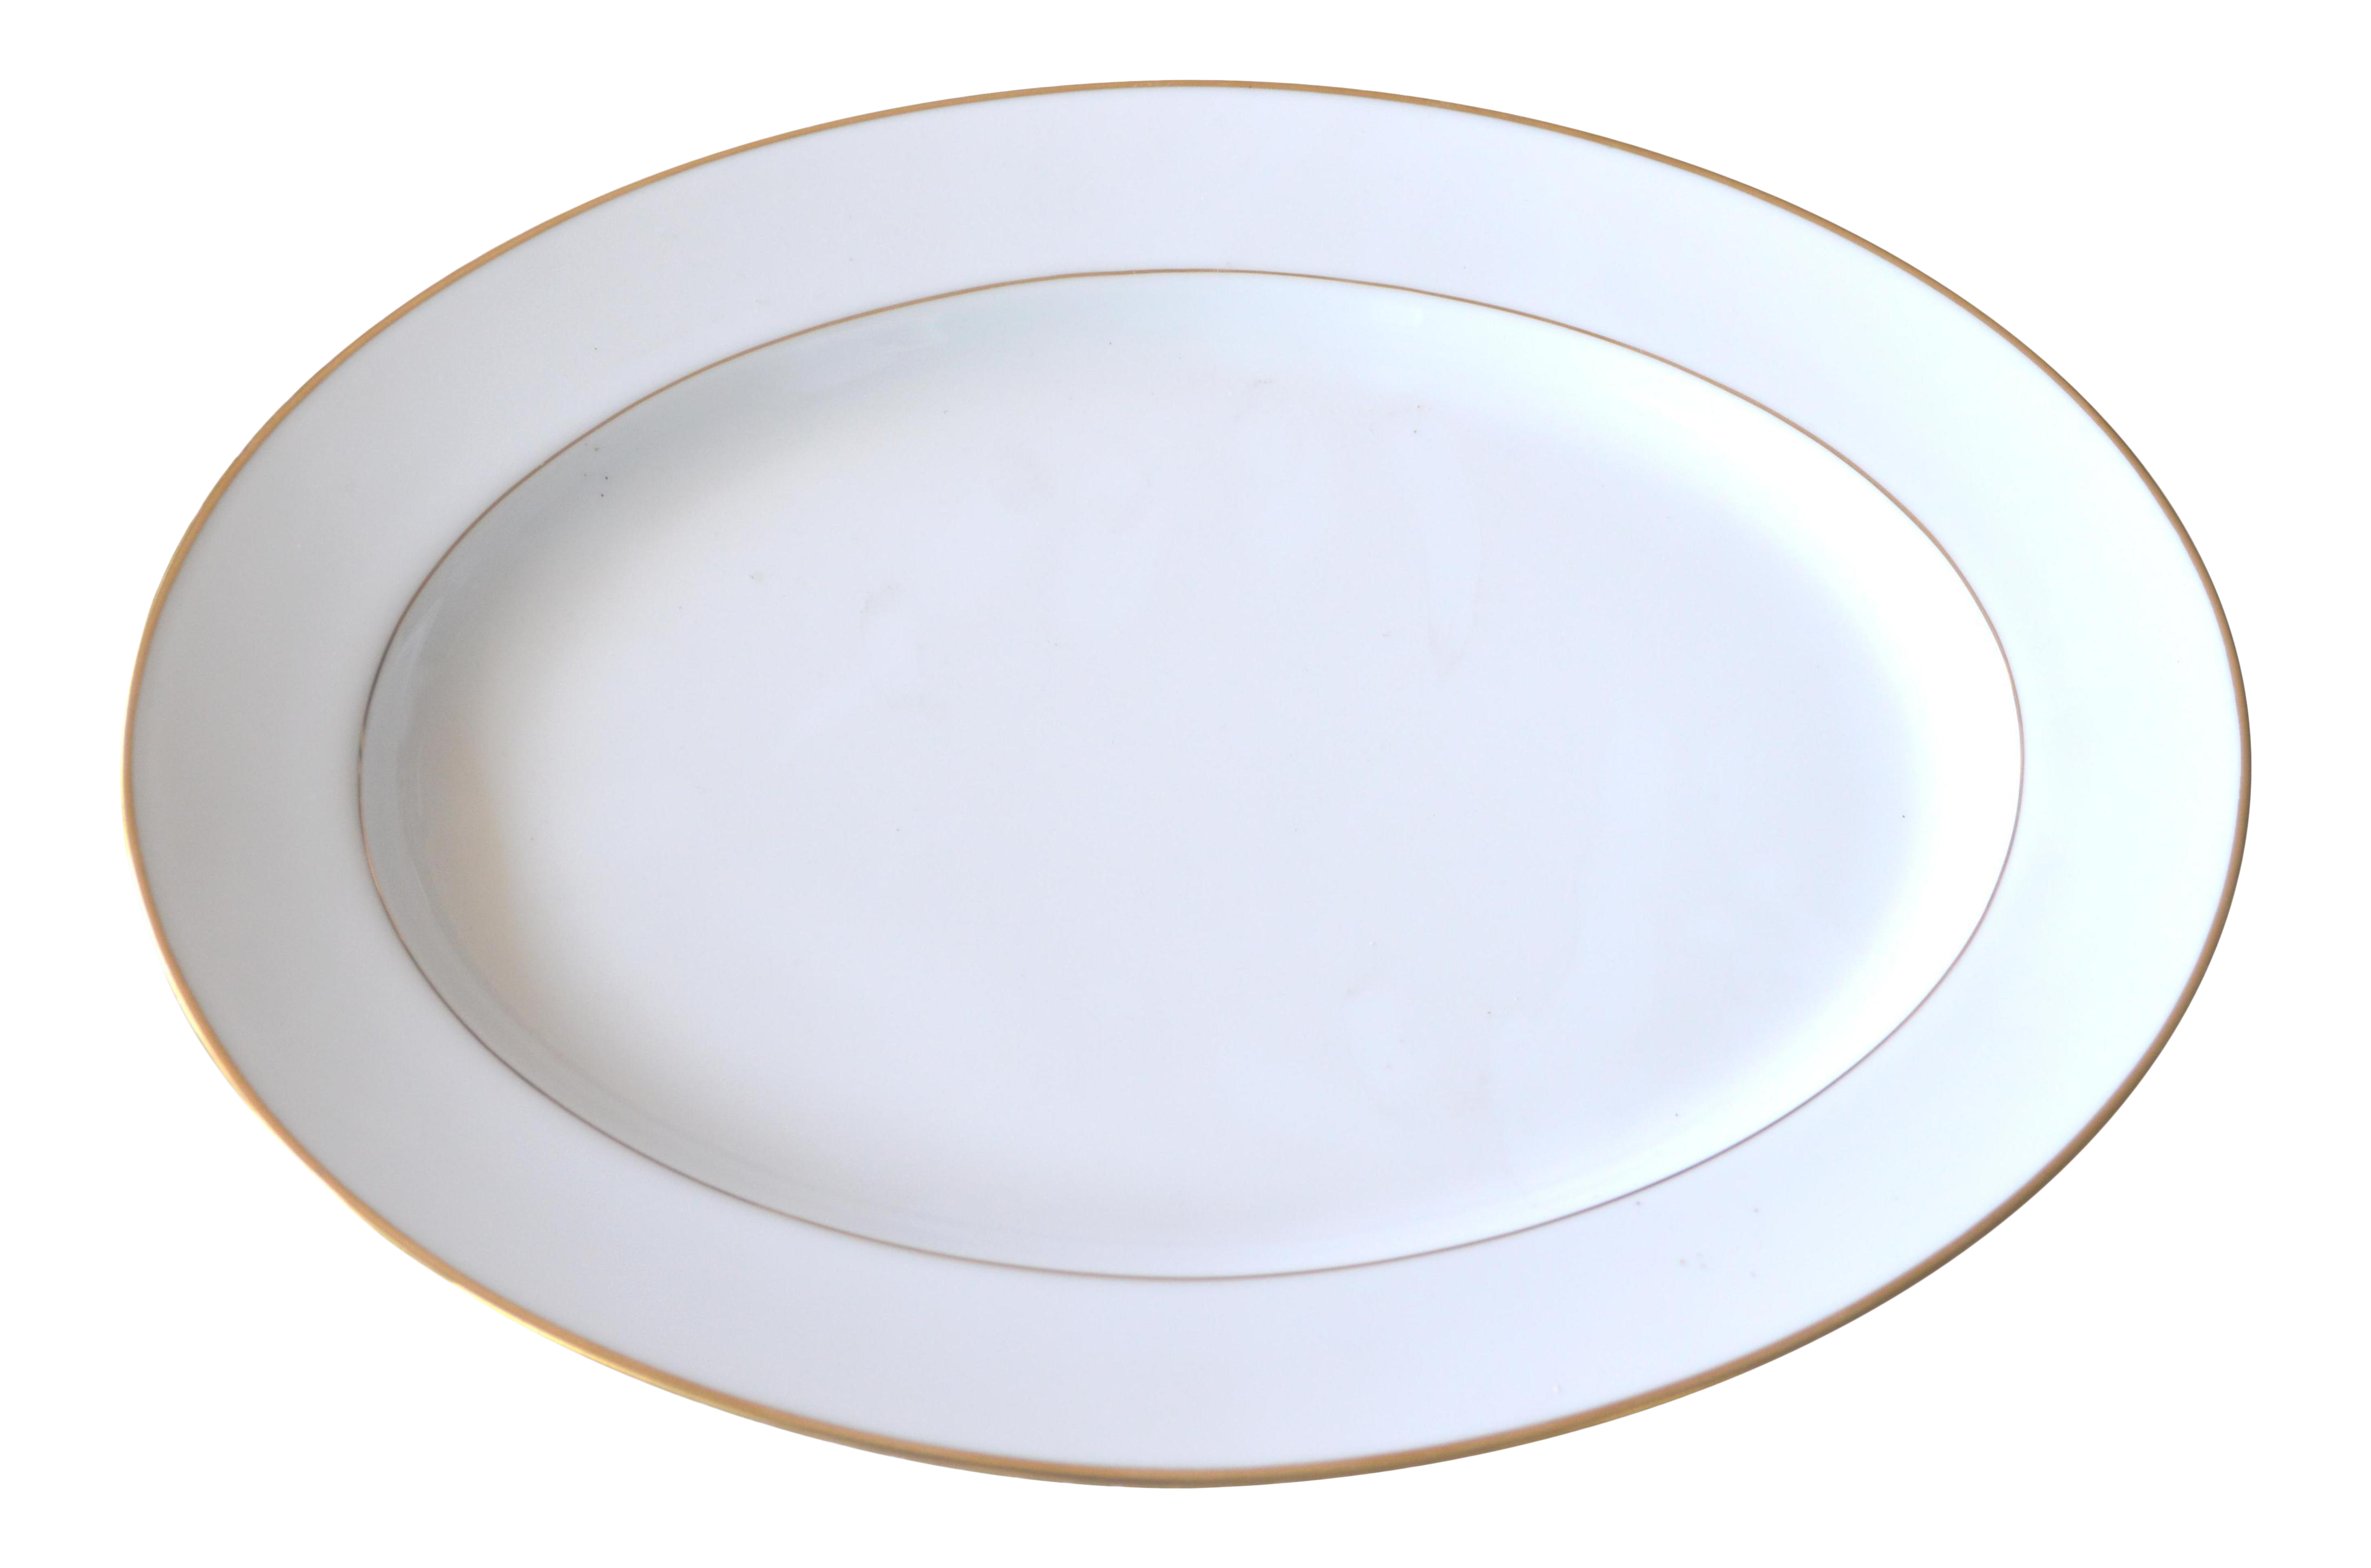 Noritake Oval White Gold Serving Platter Porcelain Gold Edge Plate  sc 1 st  Chairish & Vintage \u0026 Used Bauhaus Tableware and Barware   Chairish